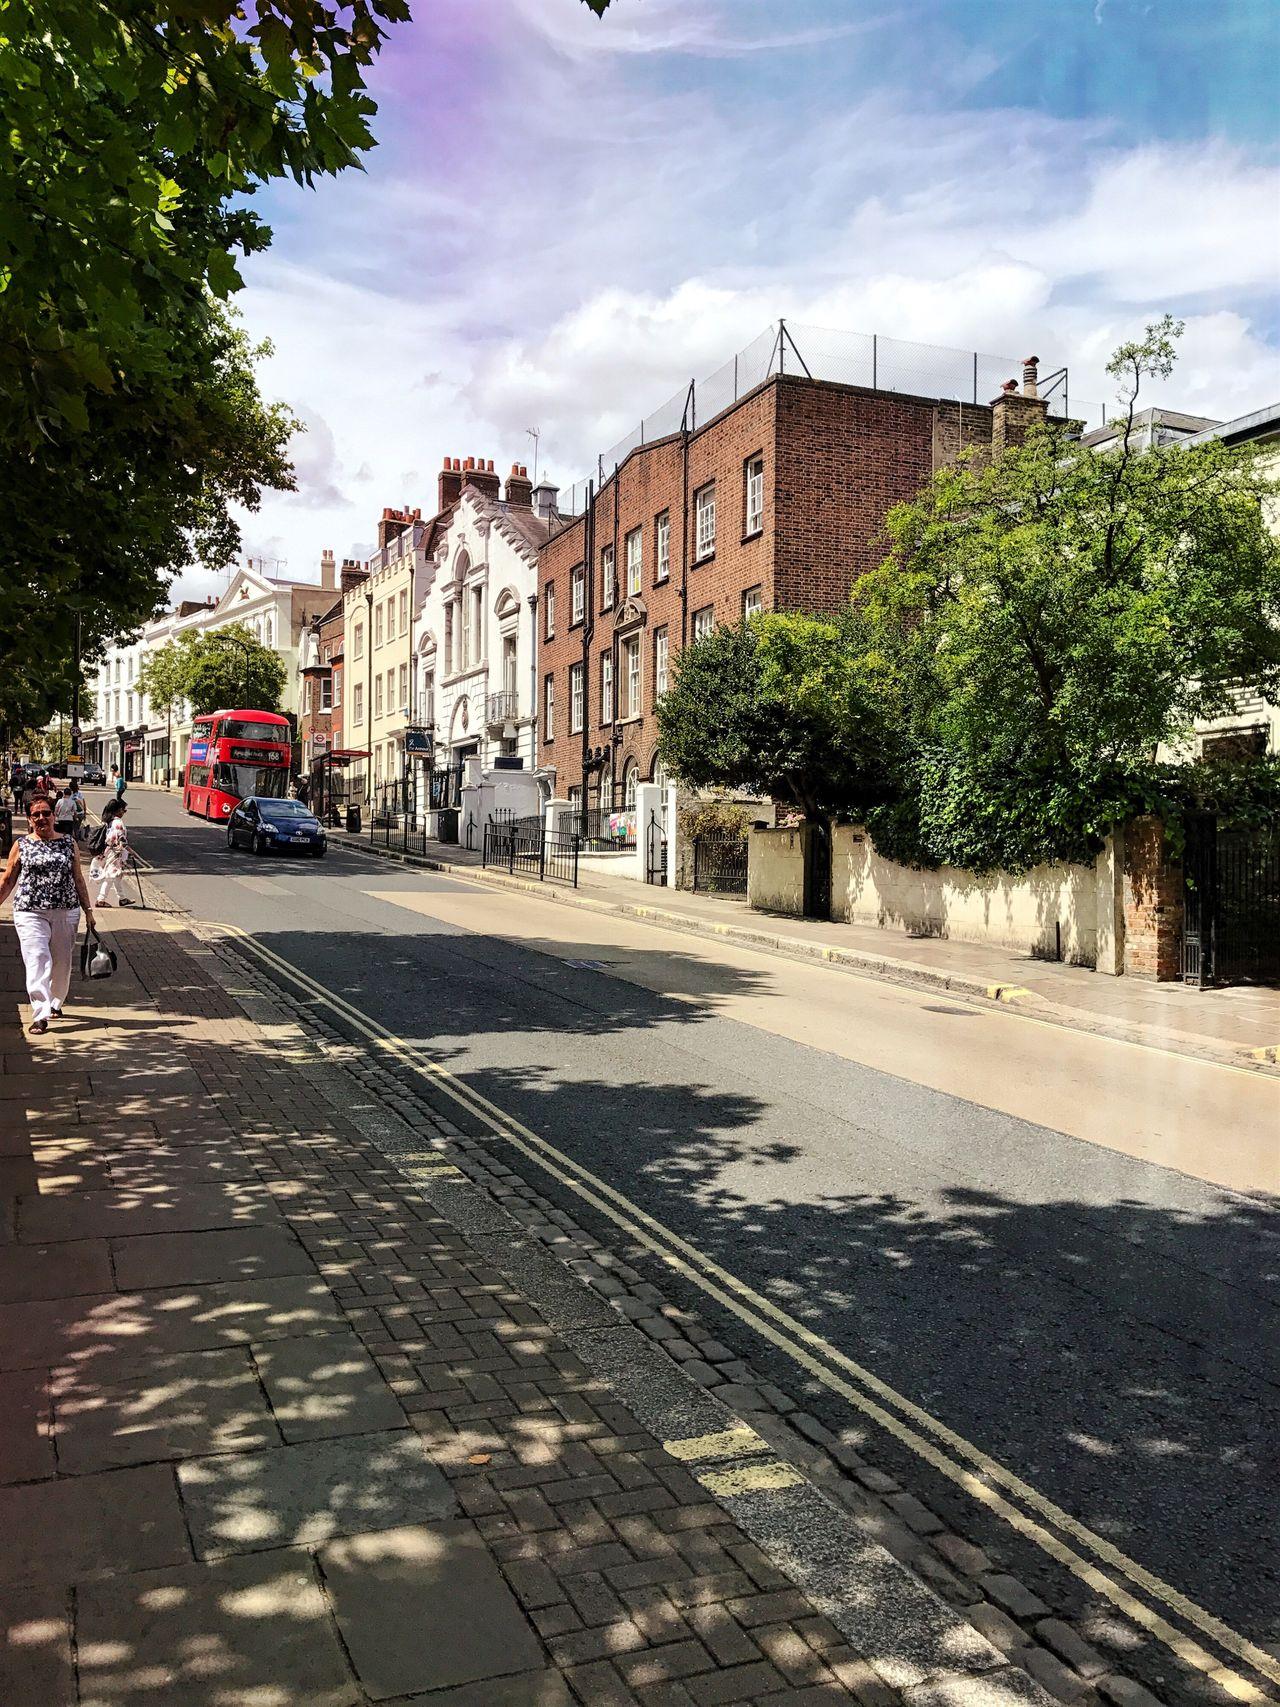 EyeEm LOST IN London Sky Street Transportation Nw3 Hampstead Heath Pond Street Royal Free Hospital